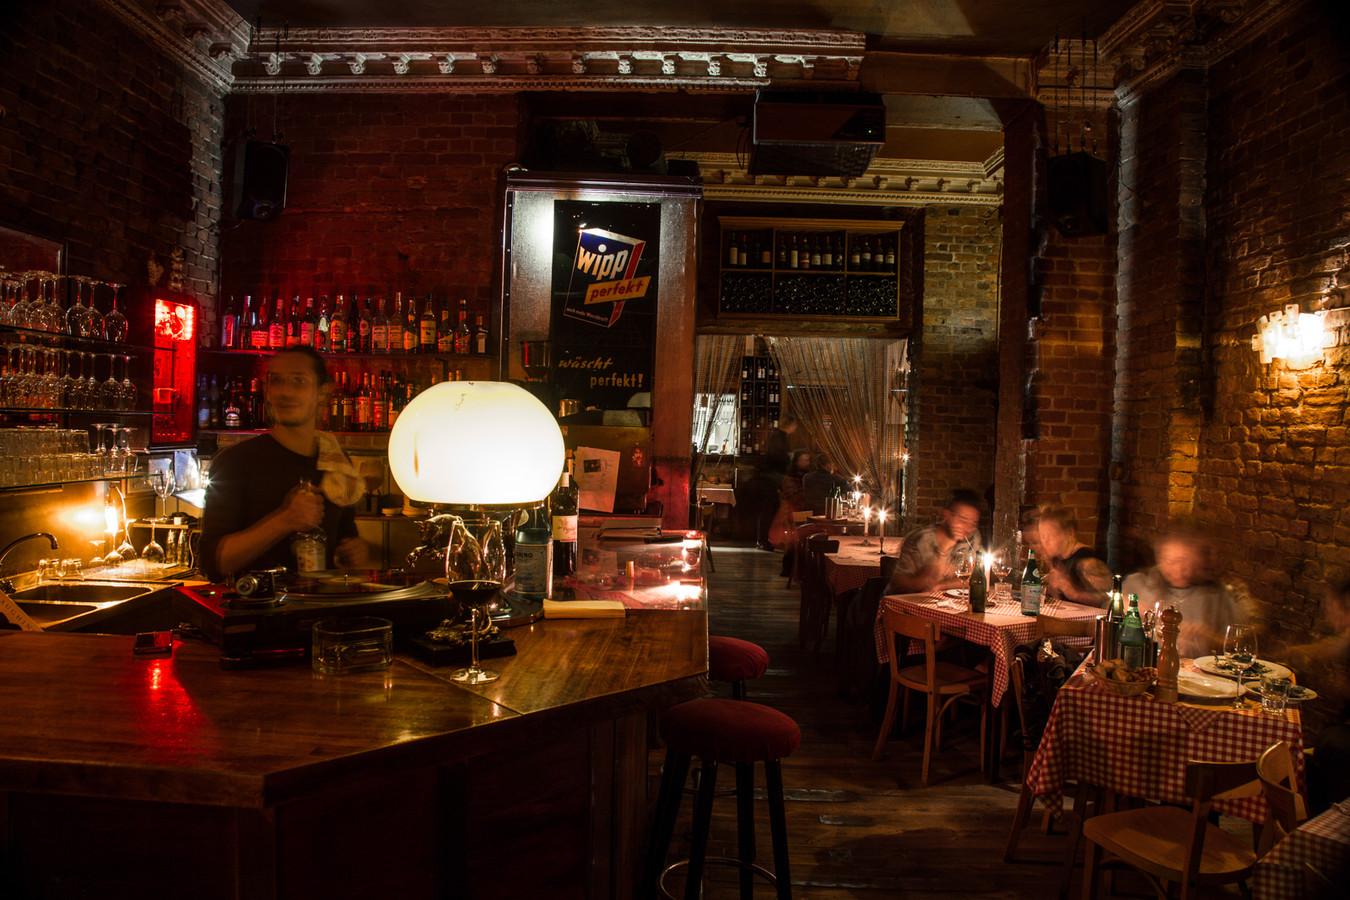 Fotos de Ristorante - Der Goldene Hahn